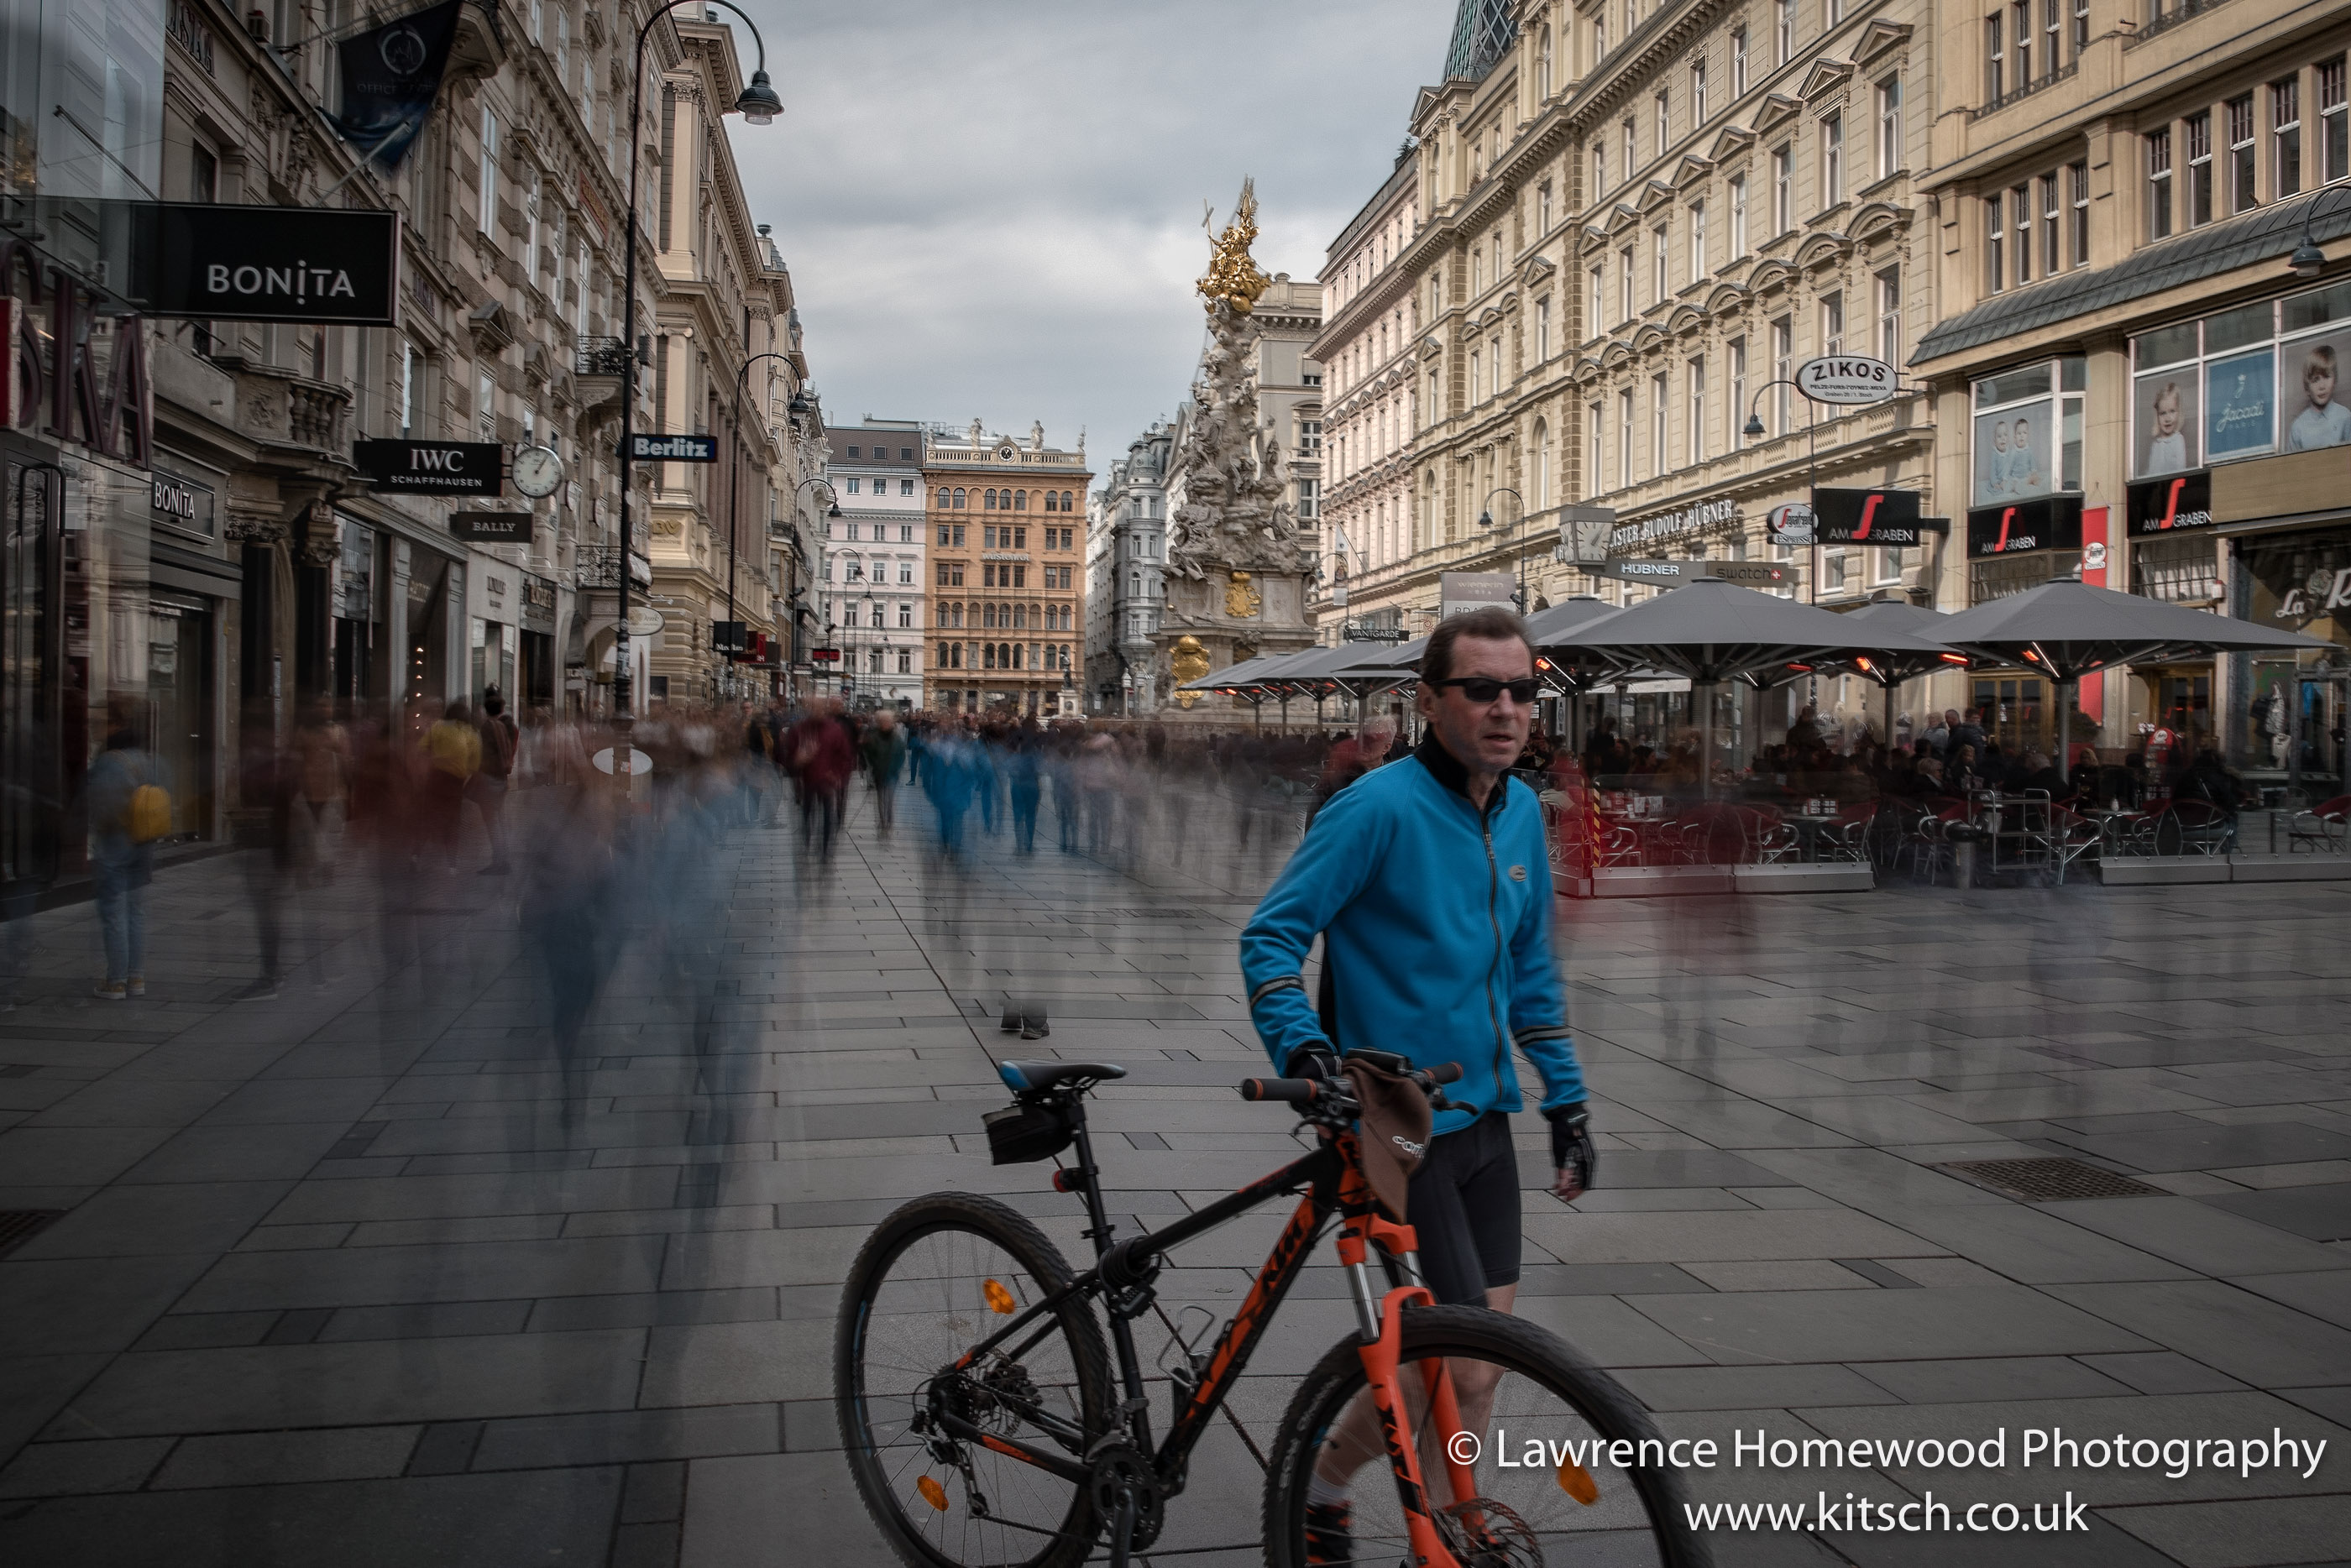 Blurred Motion Vienna Highstreet